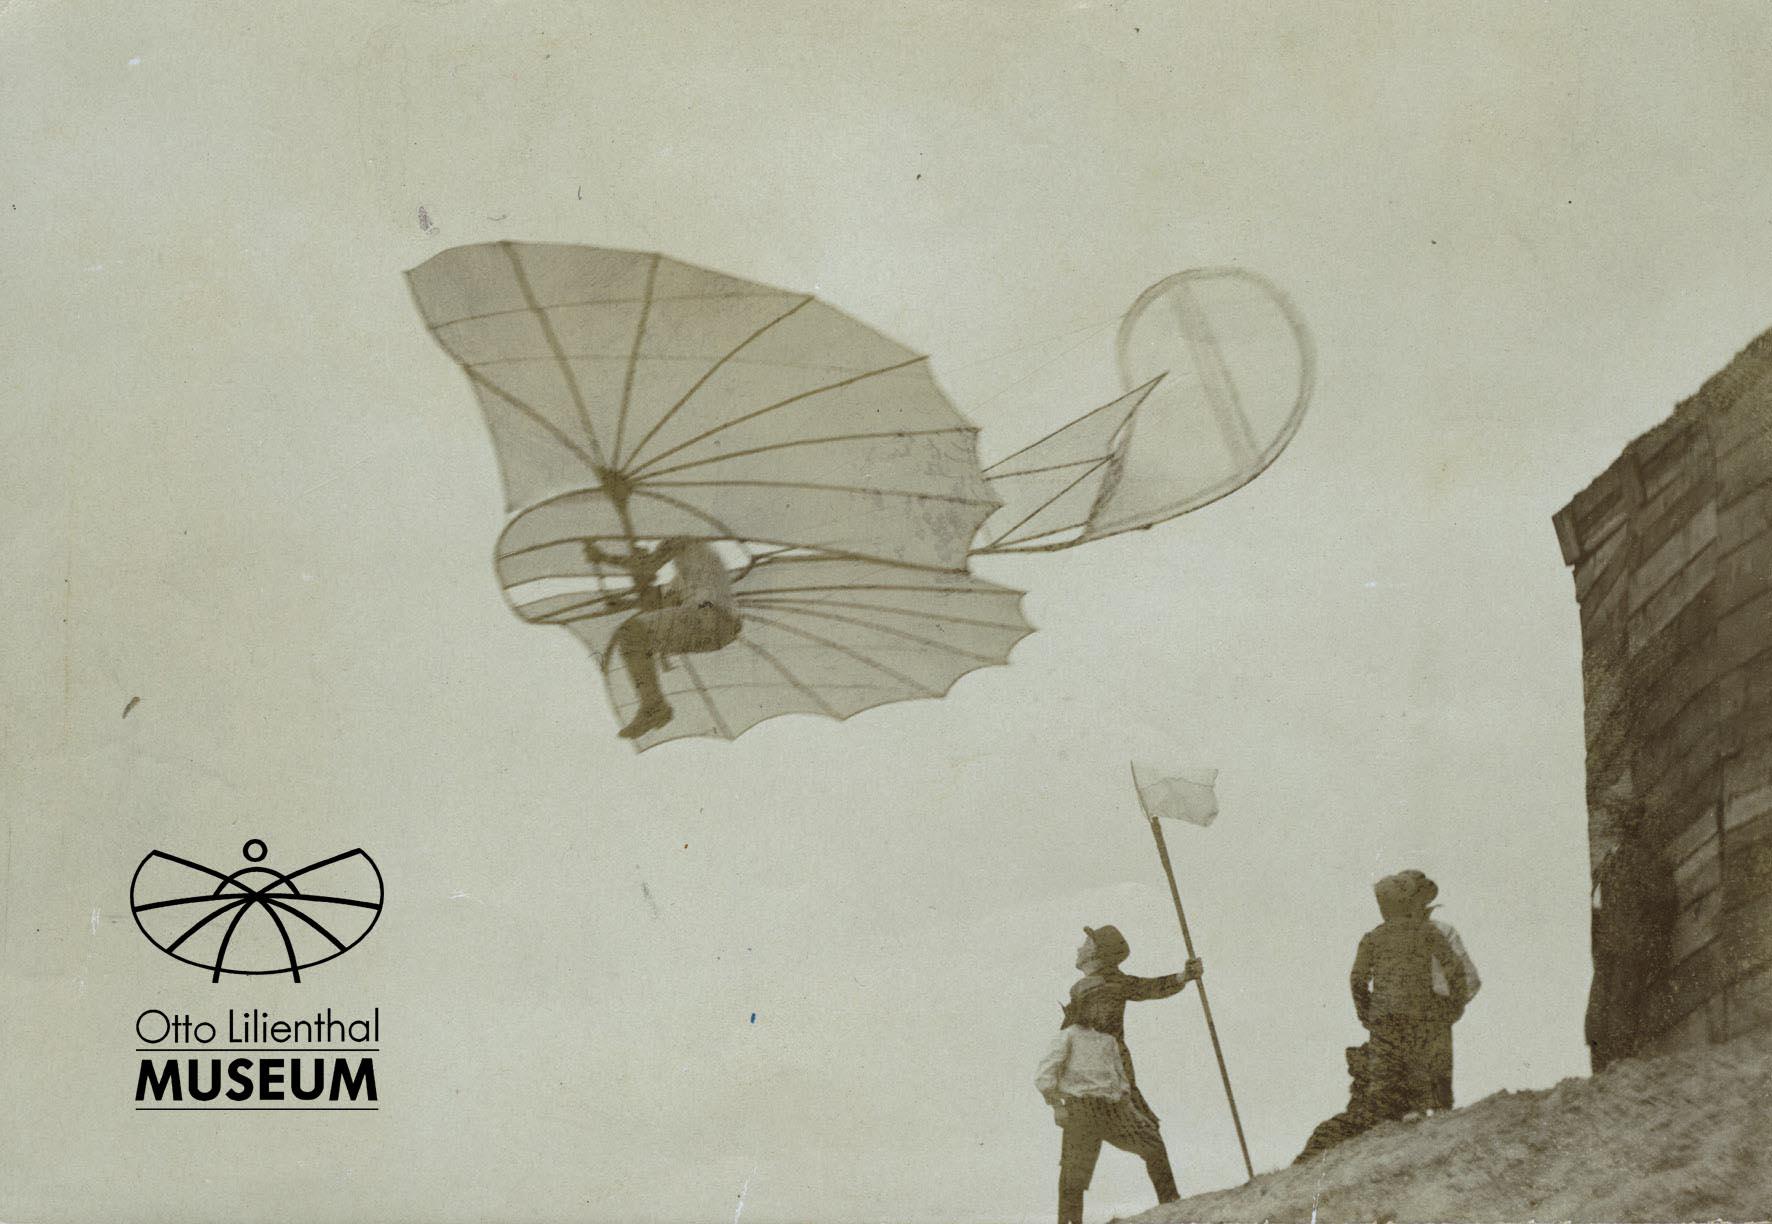 Pressefoto aus dem Otto-Lilienthal-Museum